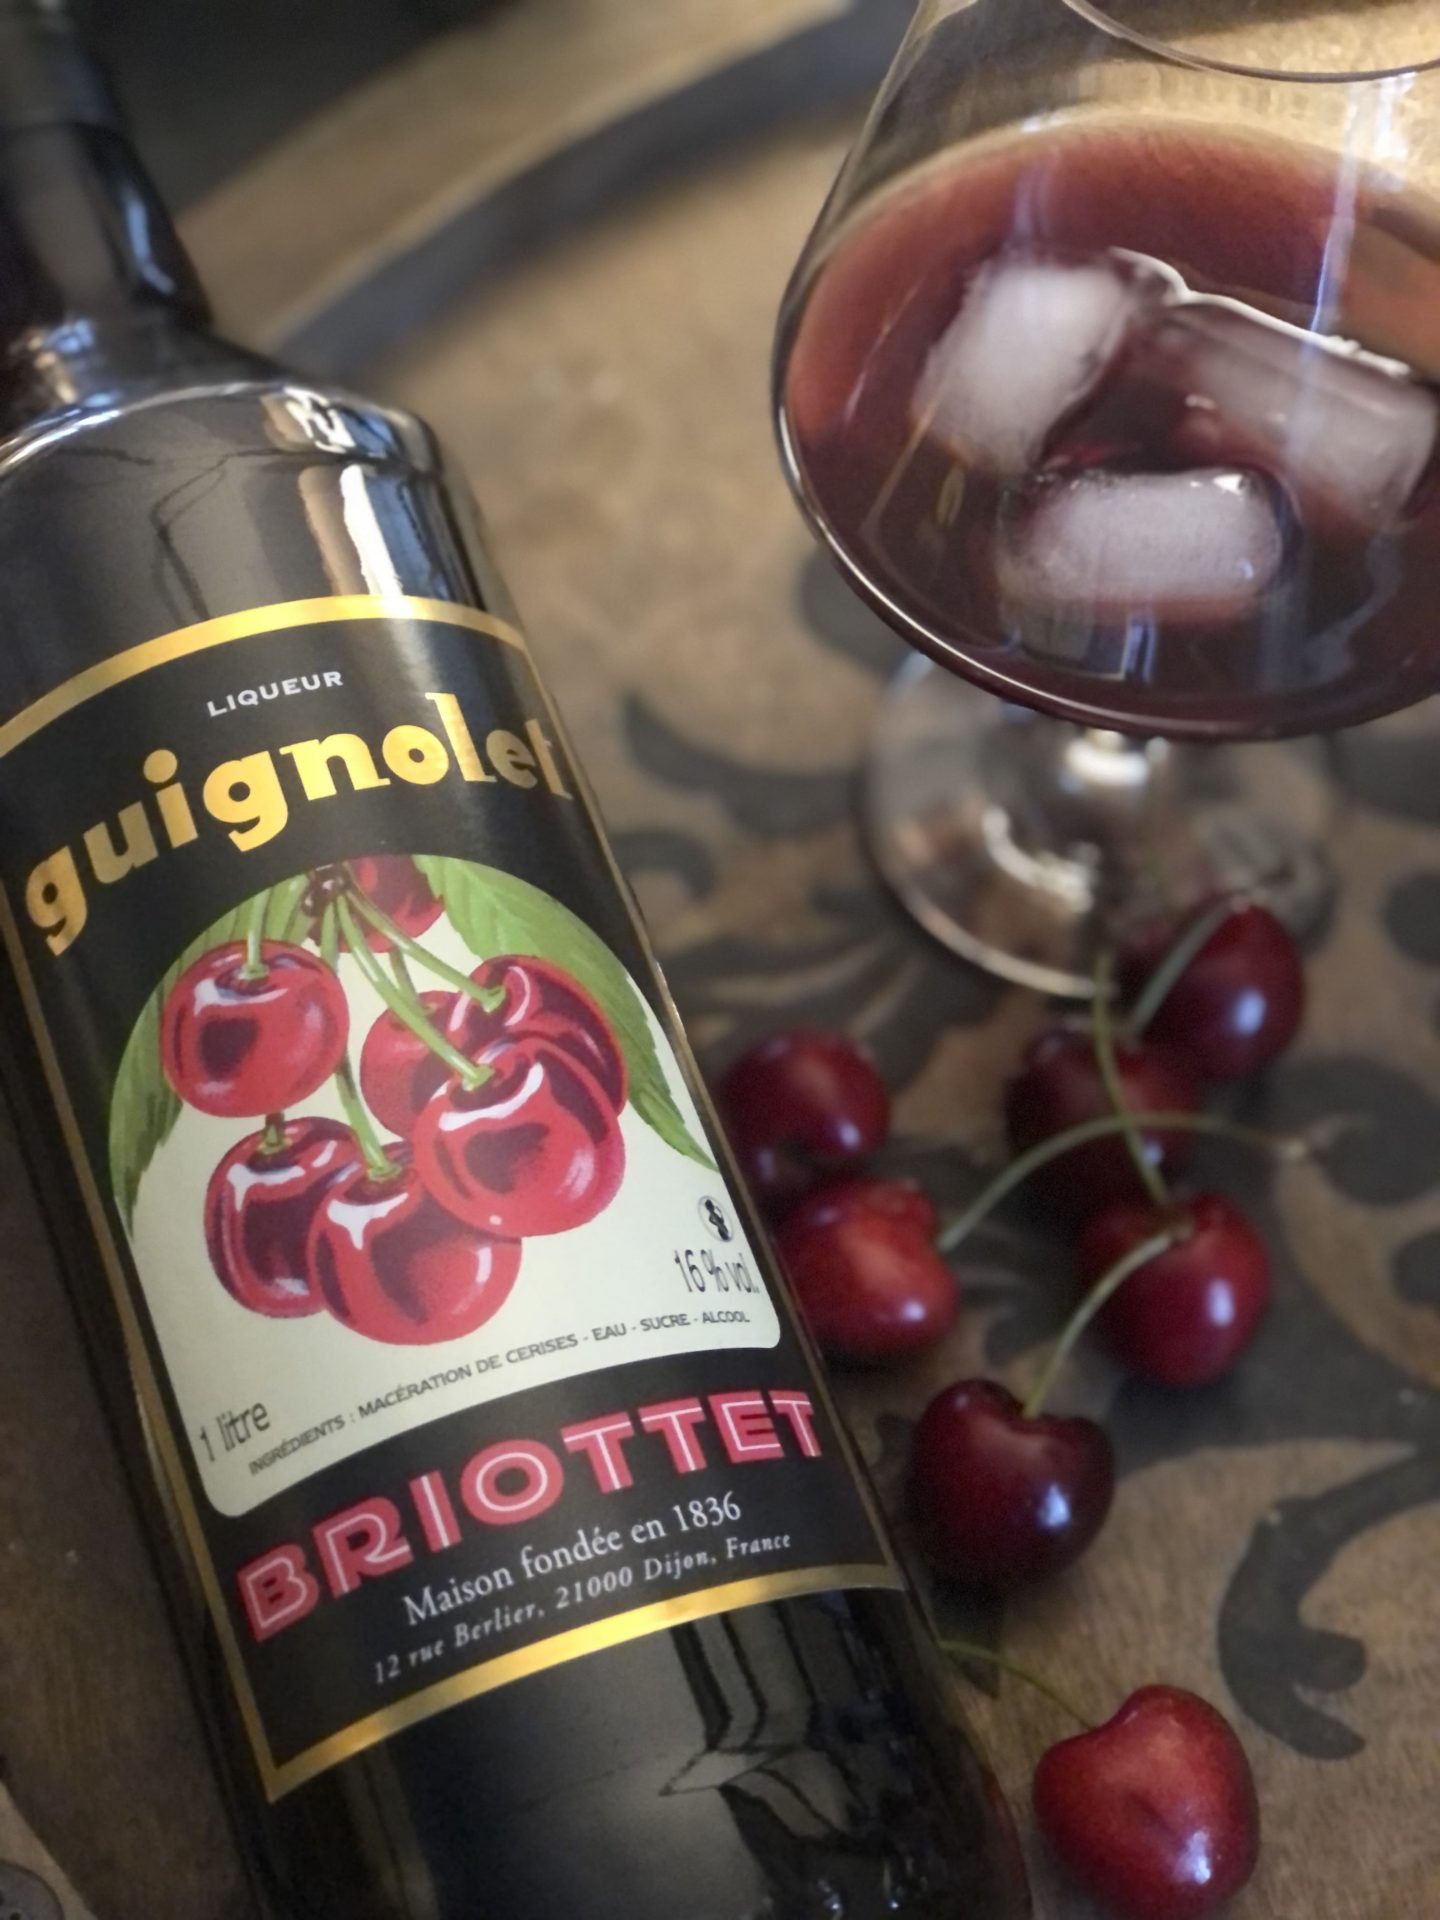 Guignolet-Cerise-Briottet